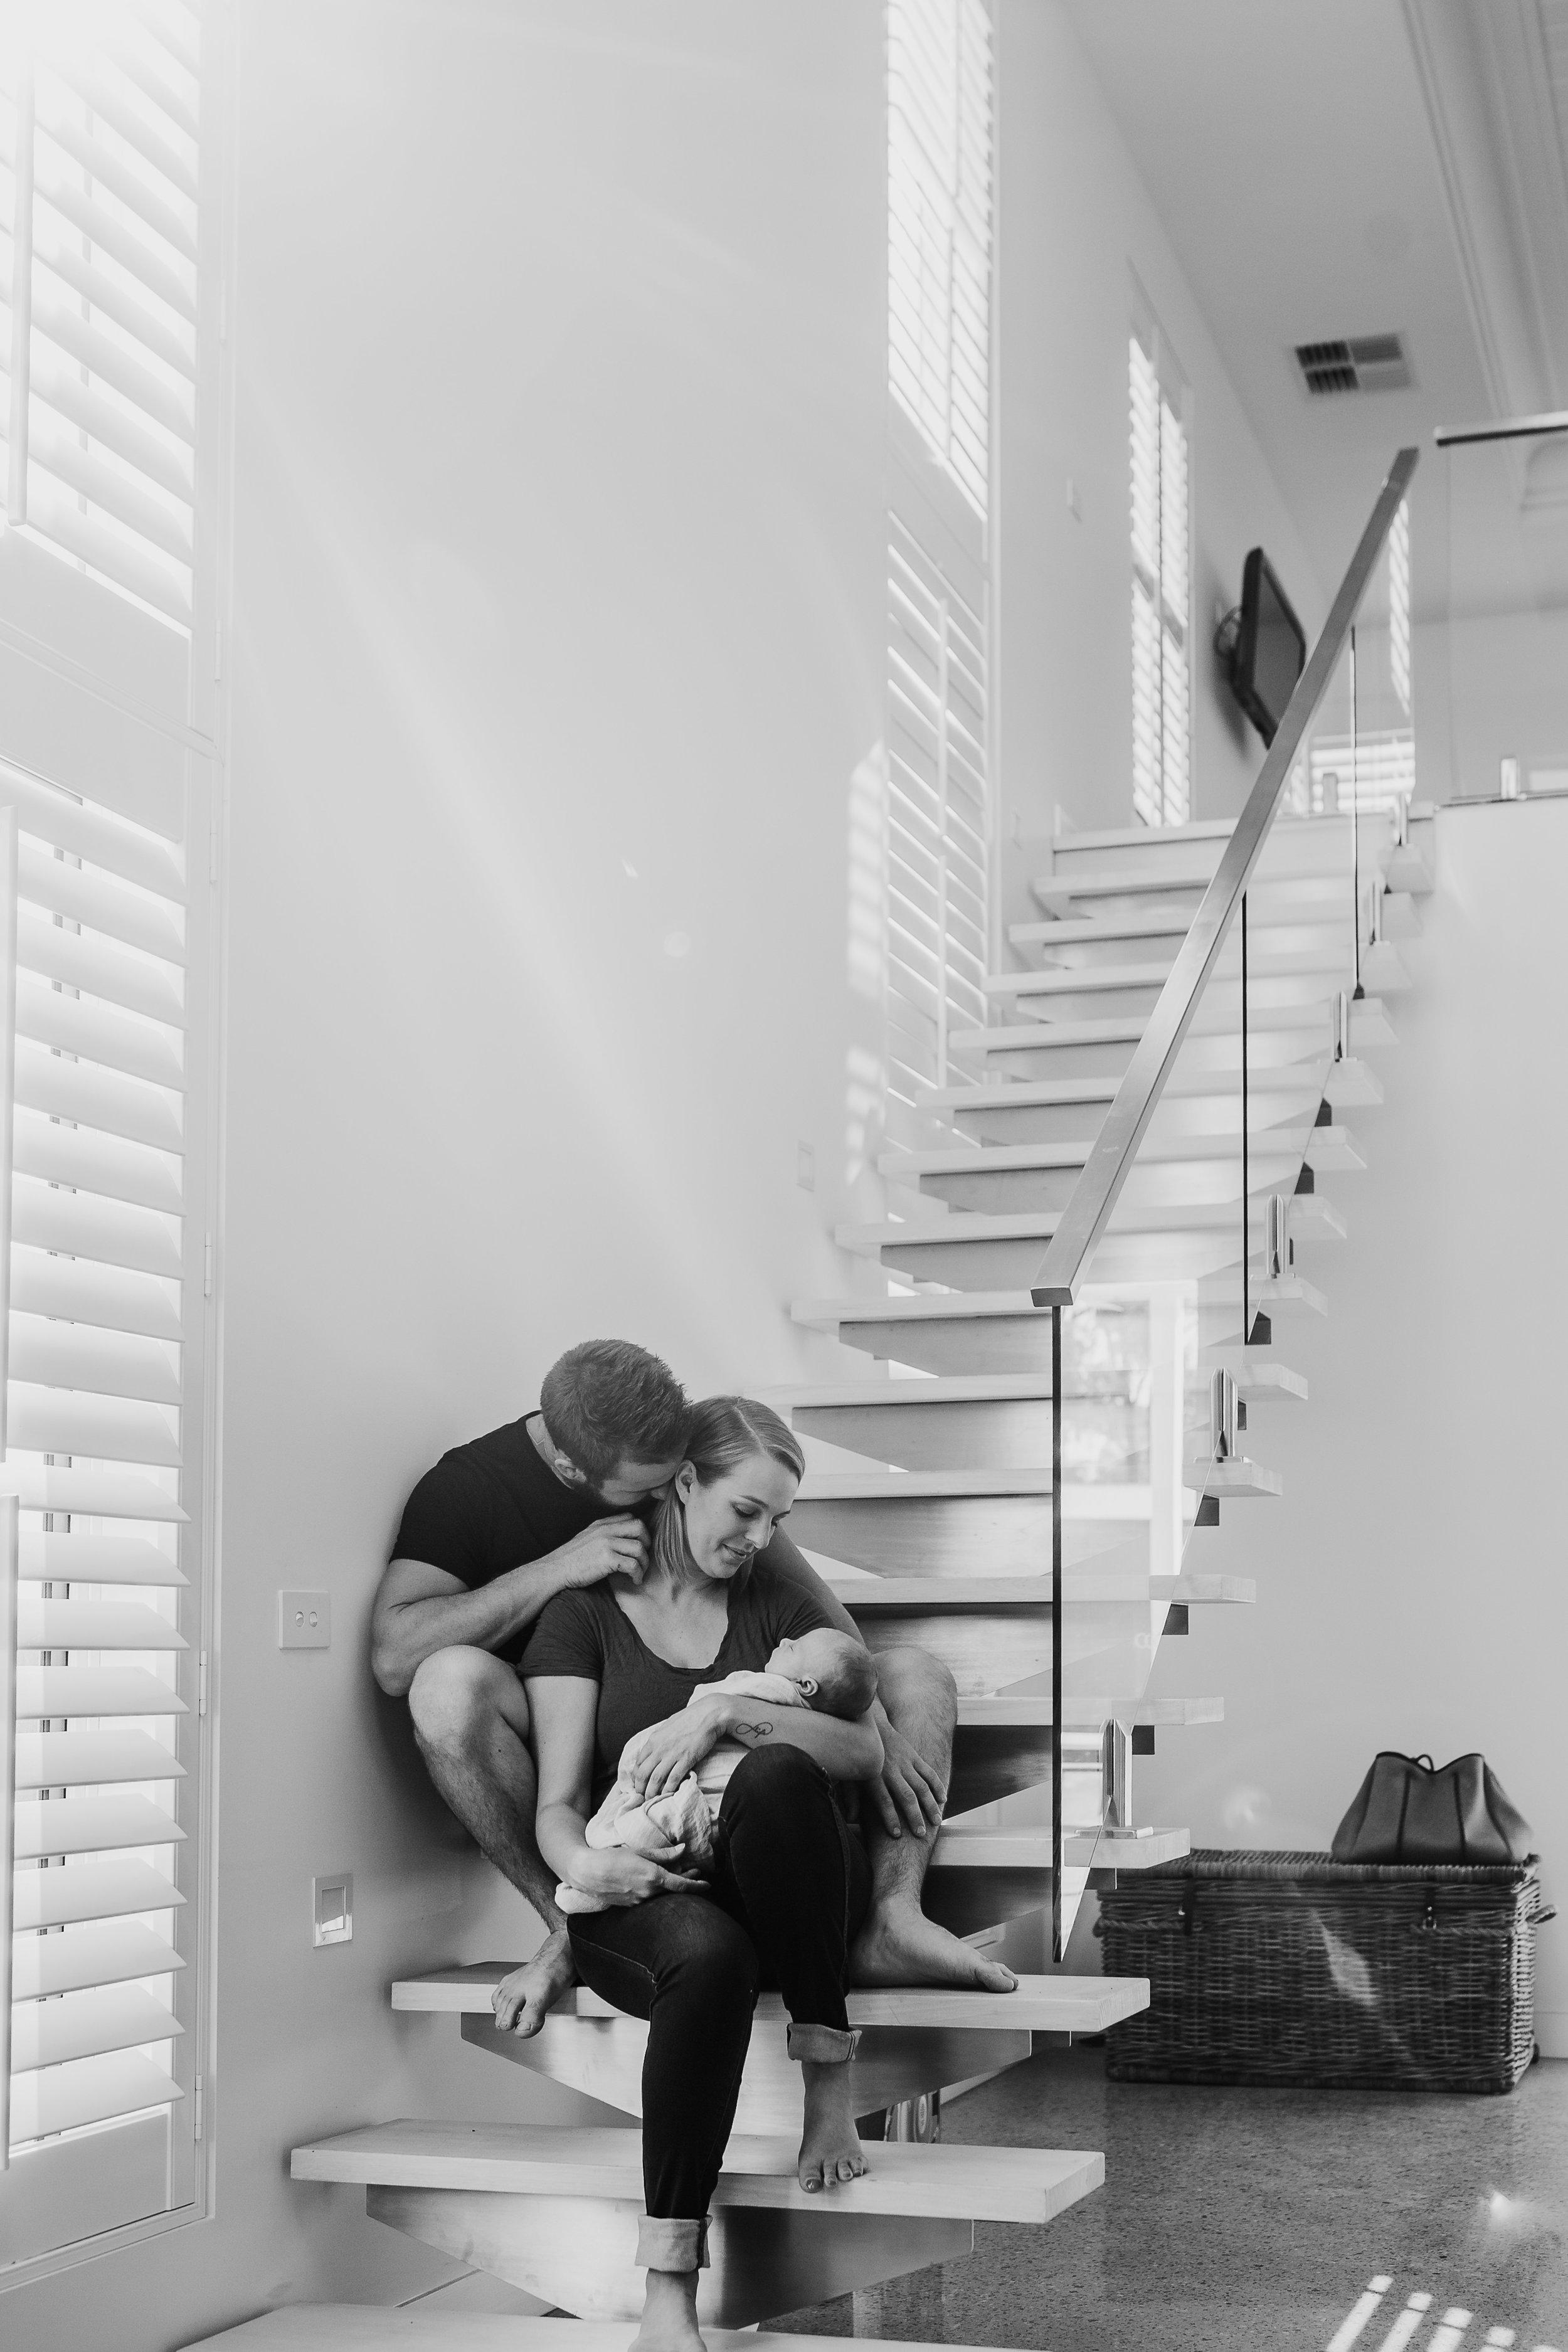 mickalathomas_puremacphotography_weddingphotographer_couplephotographer_Sheppartonphotographer_1701.jpg